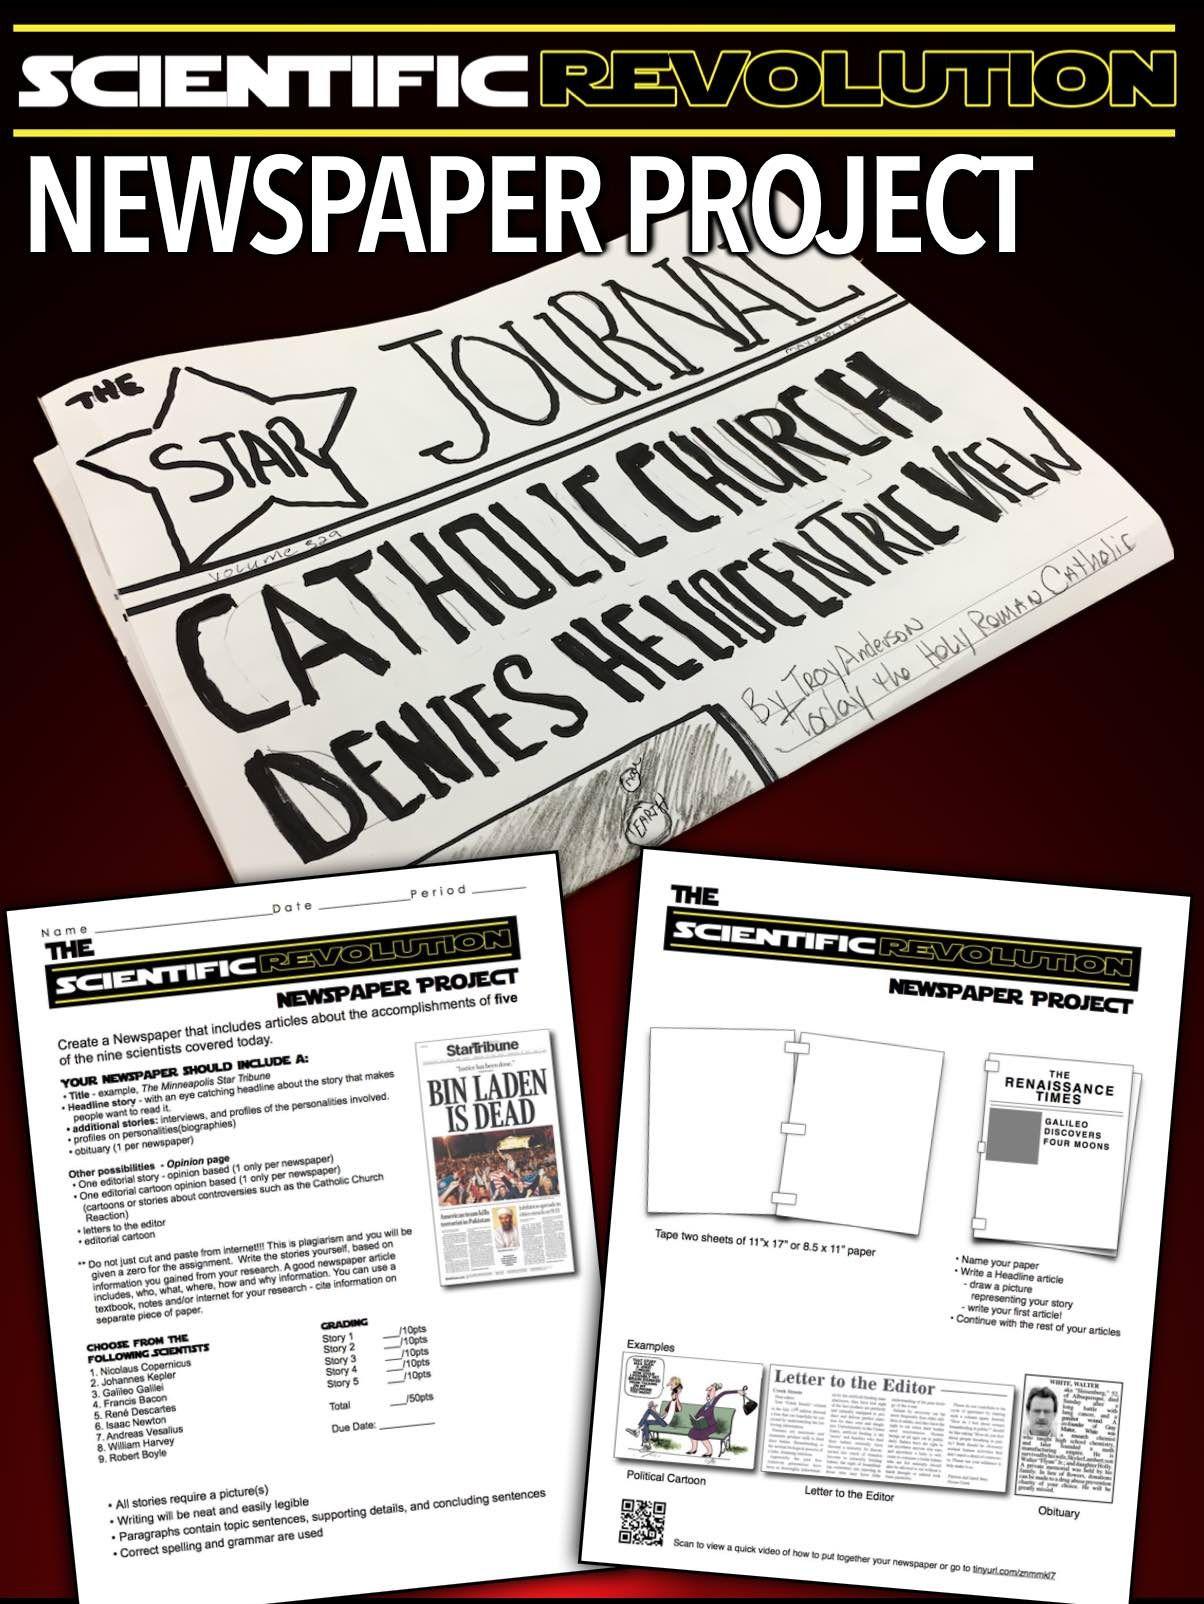 Scientific Revolution Newspaper Project